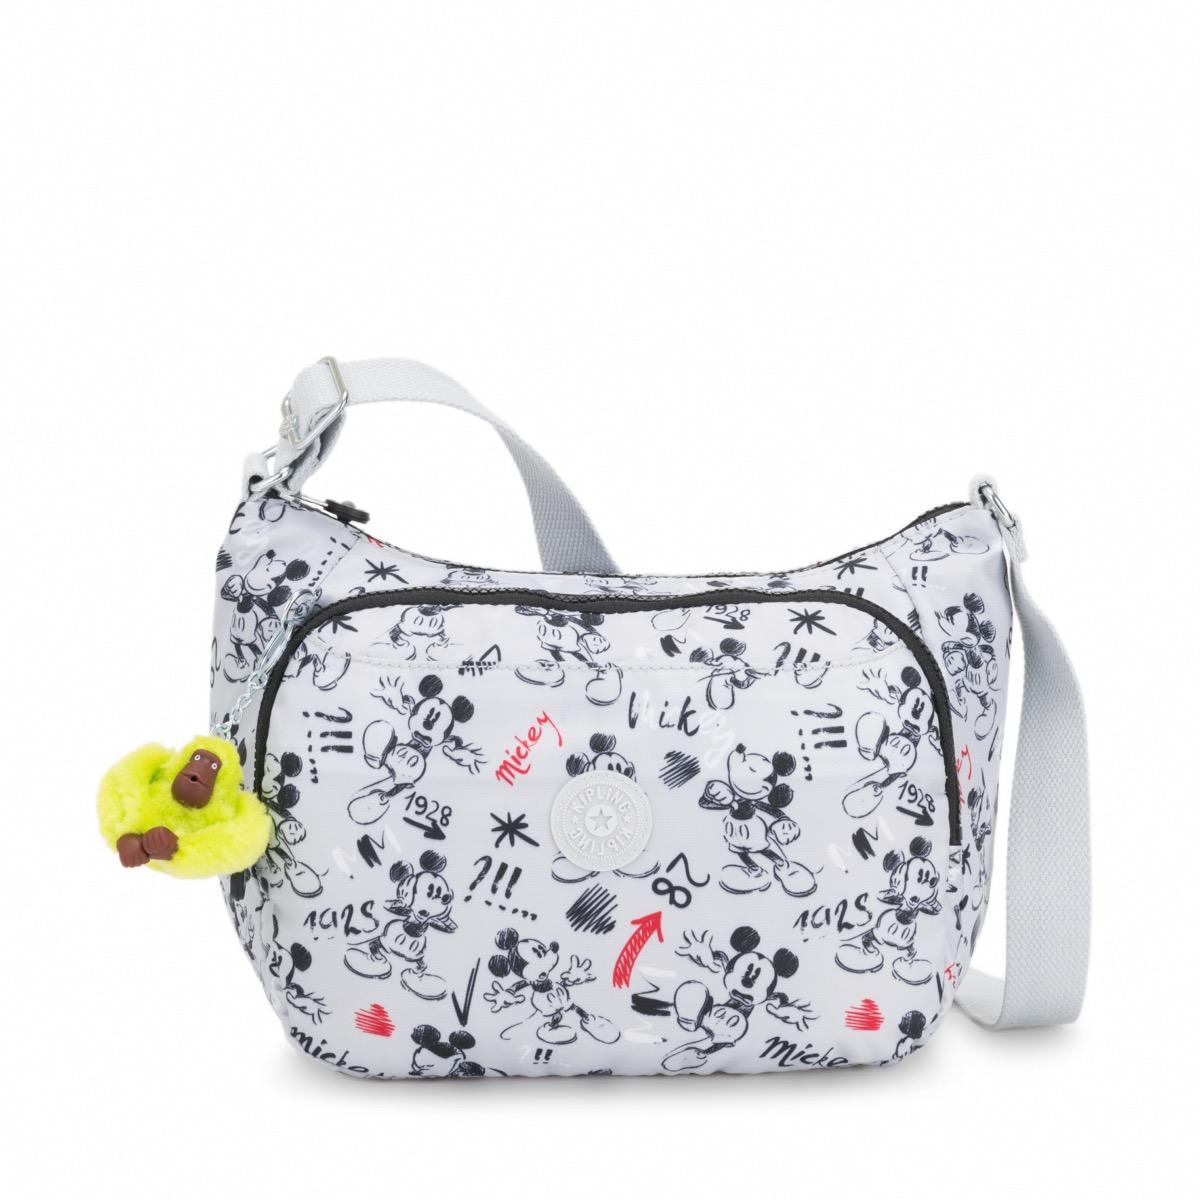 2ad4c75193 Kipling Disney D Cai Medium Crossbody Bag Sketch Grey